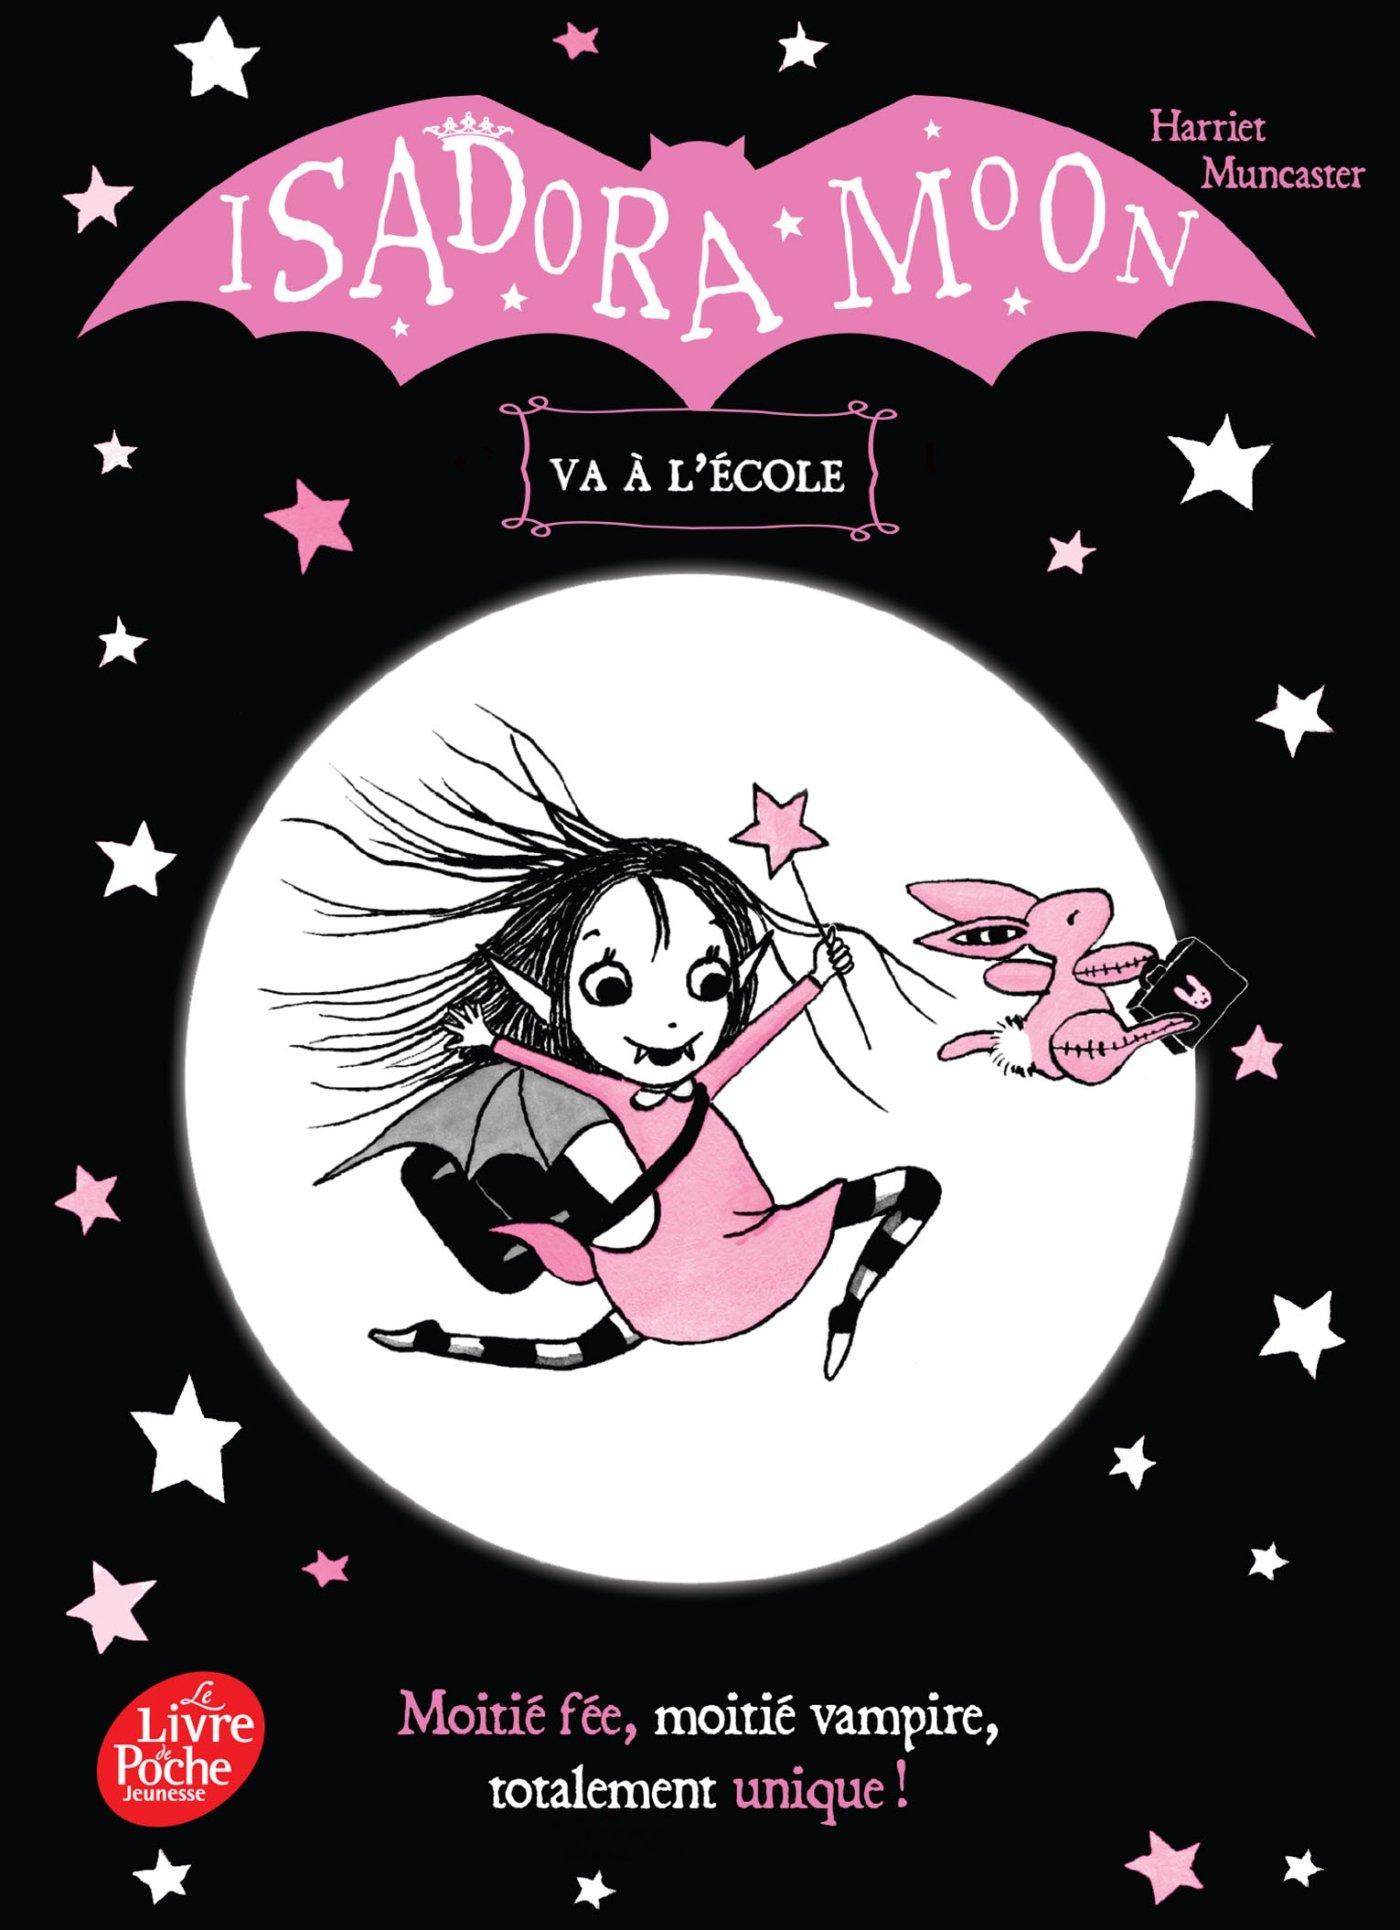 Isadora Moon va à l'école (Livre de Poche Jeunesse): Amazon.es: Harriet  Muncaster, Charlotte Faraday: Libros en idiomas extranjeros